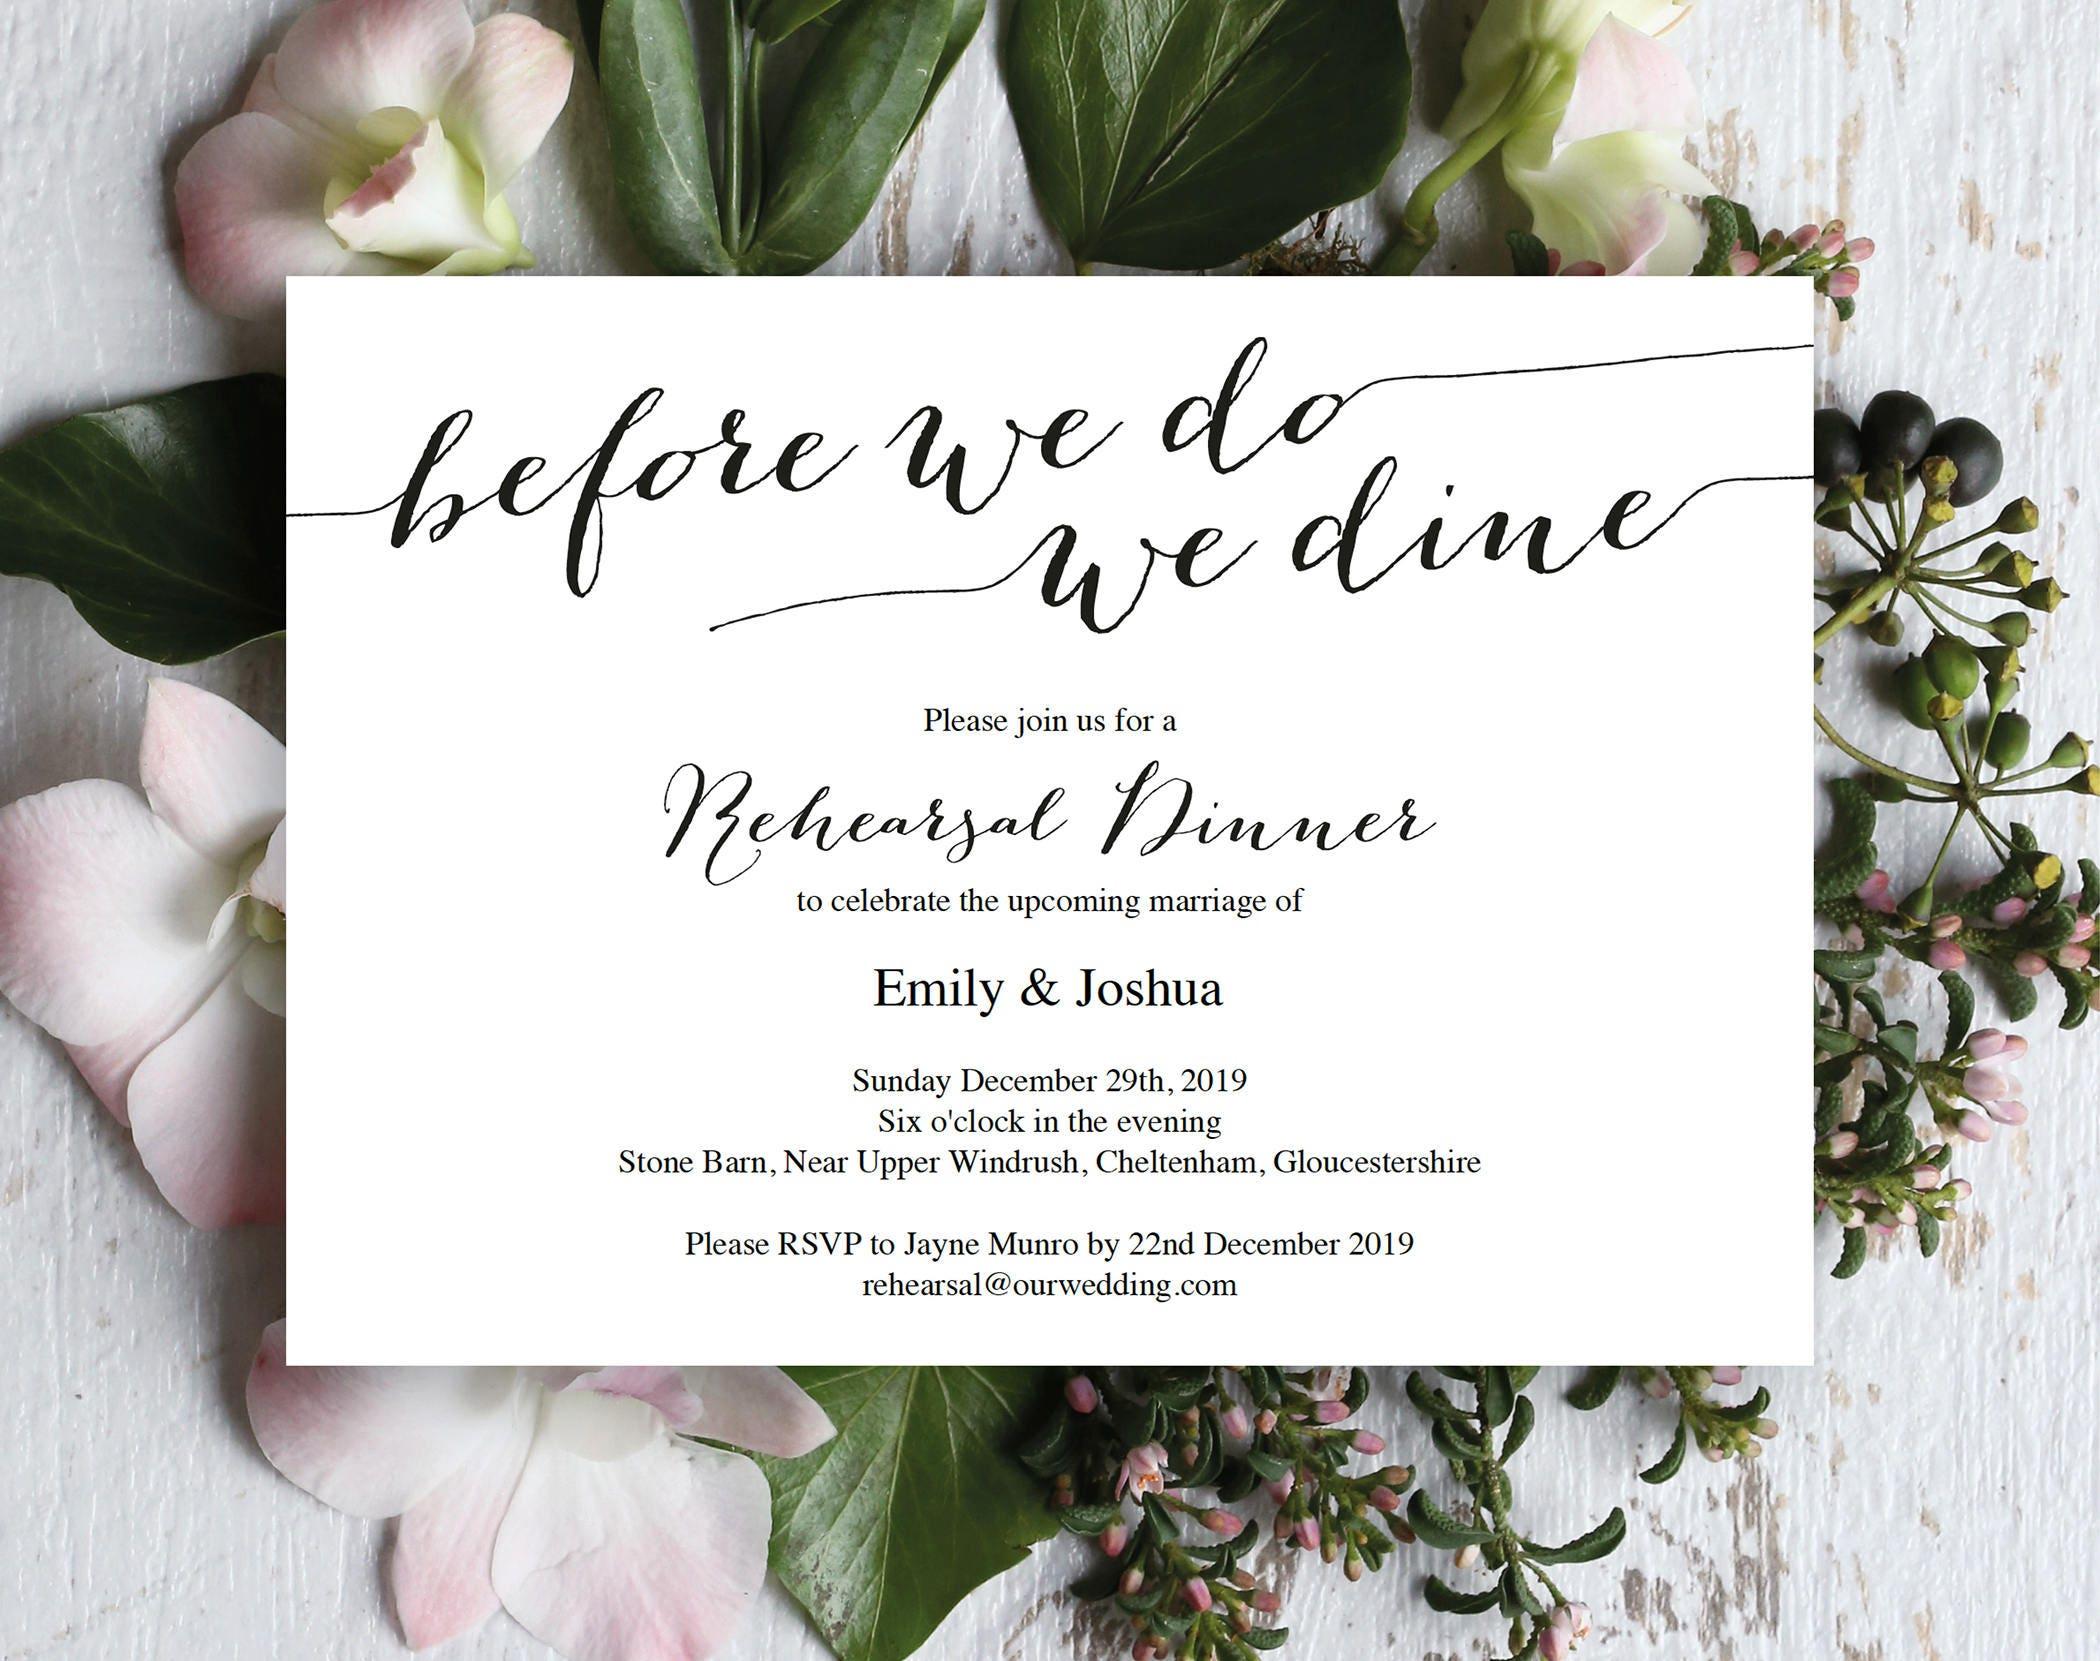 Rehearsal Dinner Invitation Template Wedding Rehearsal Rehearsal Invitation Printable Template Editable Invitation Elegant Invite